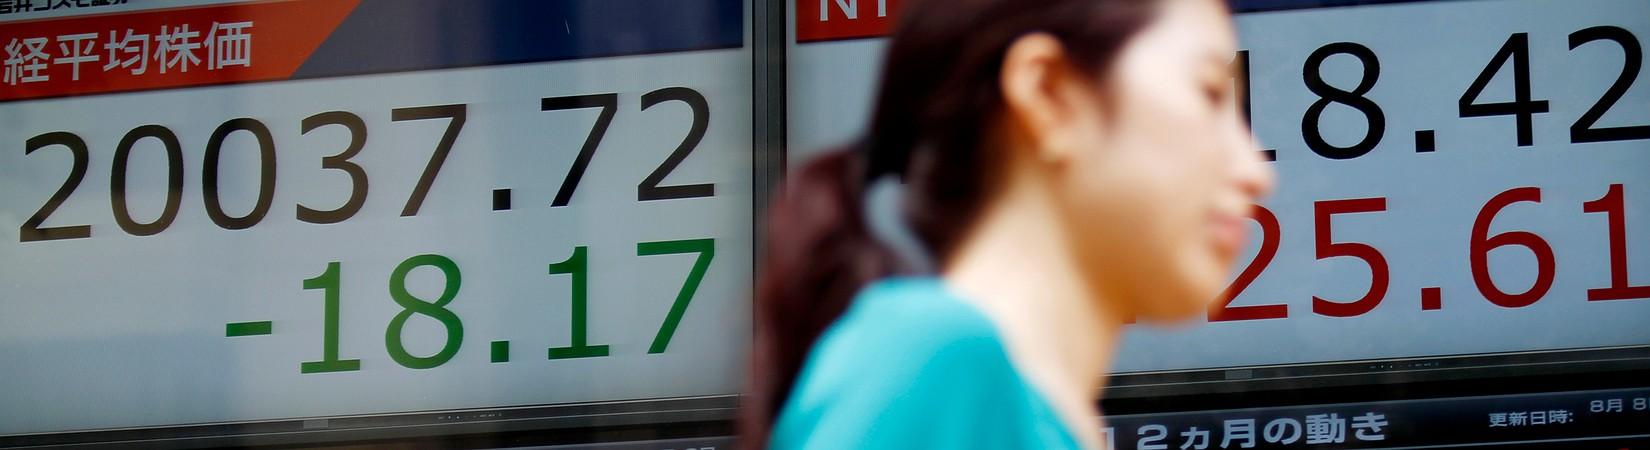 Азиатские рынки падают на фоне обострения отношений между США и КНДР